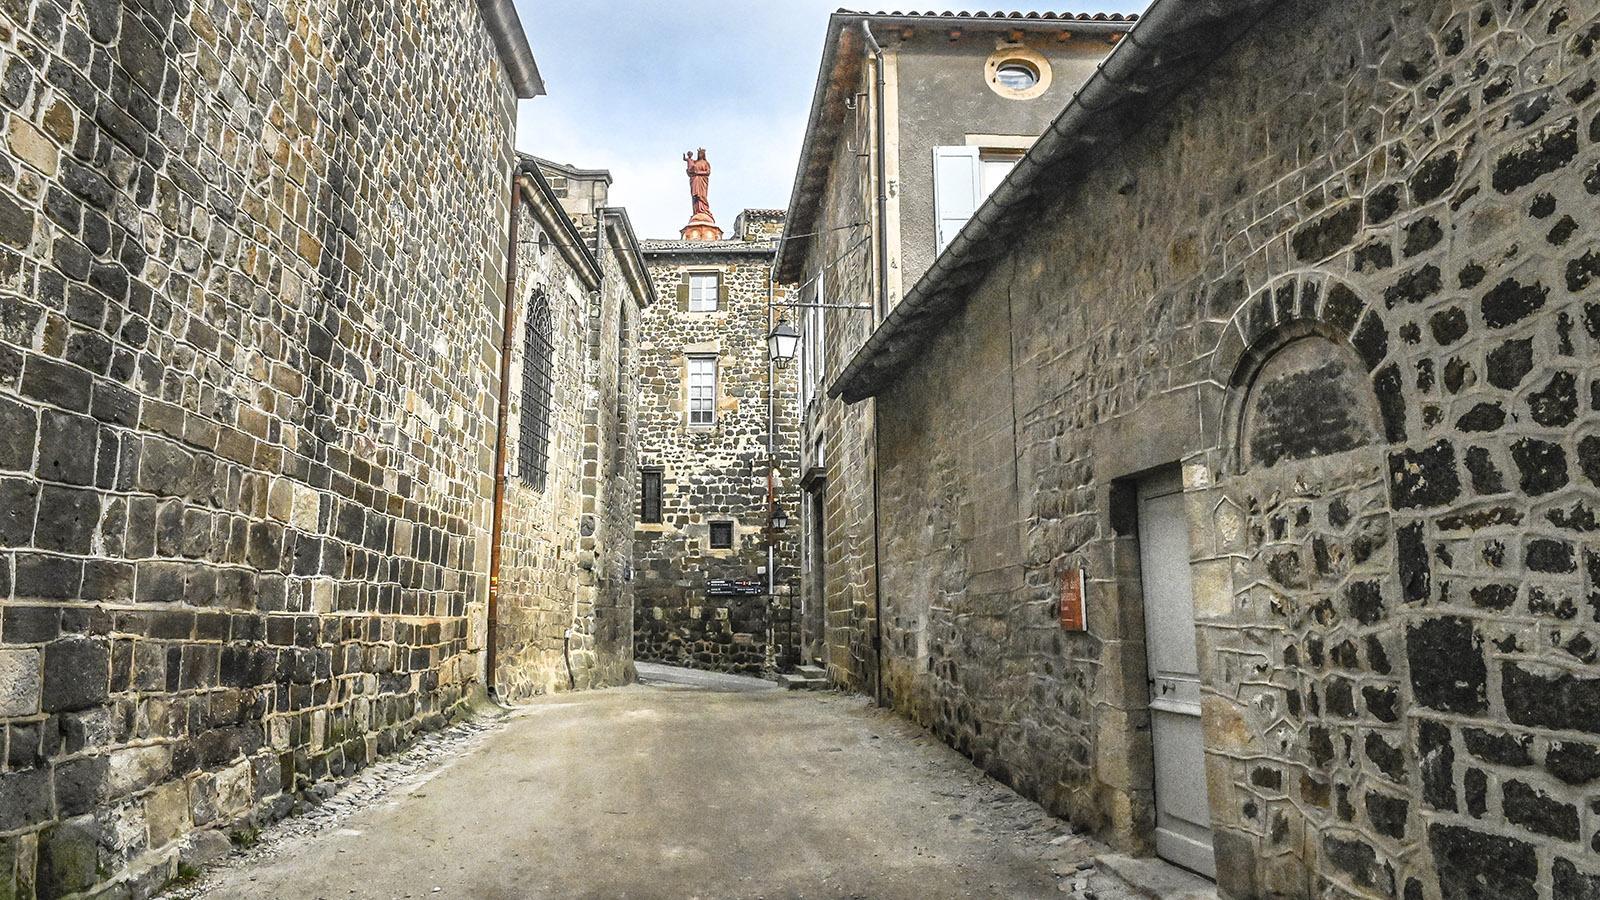 In der heiligen Oberstadt von Le Puy-en-Velay. Foto: Hilke Maunder